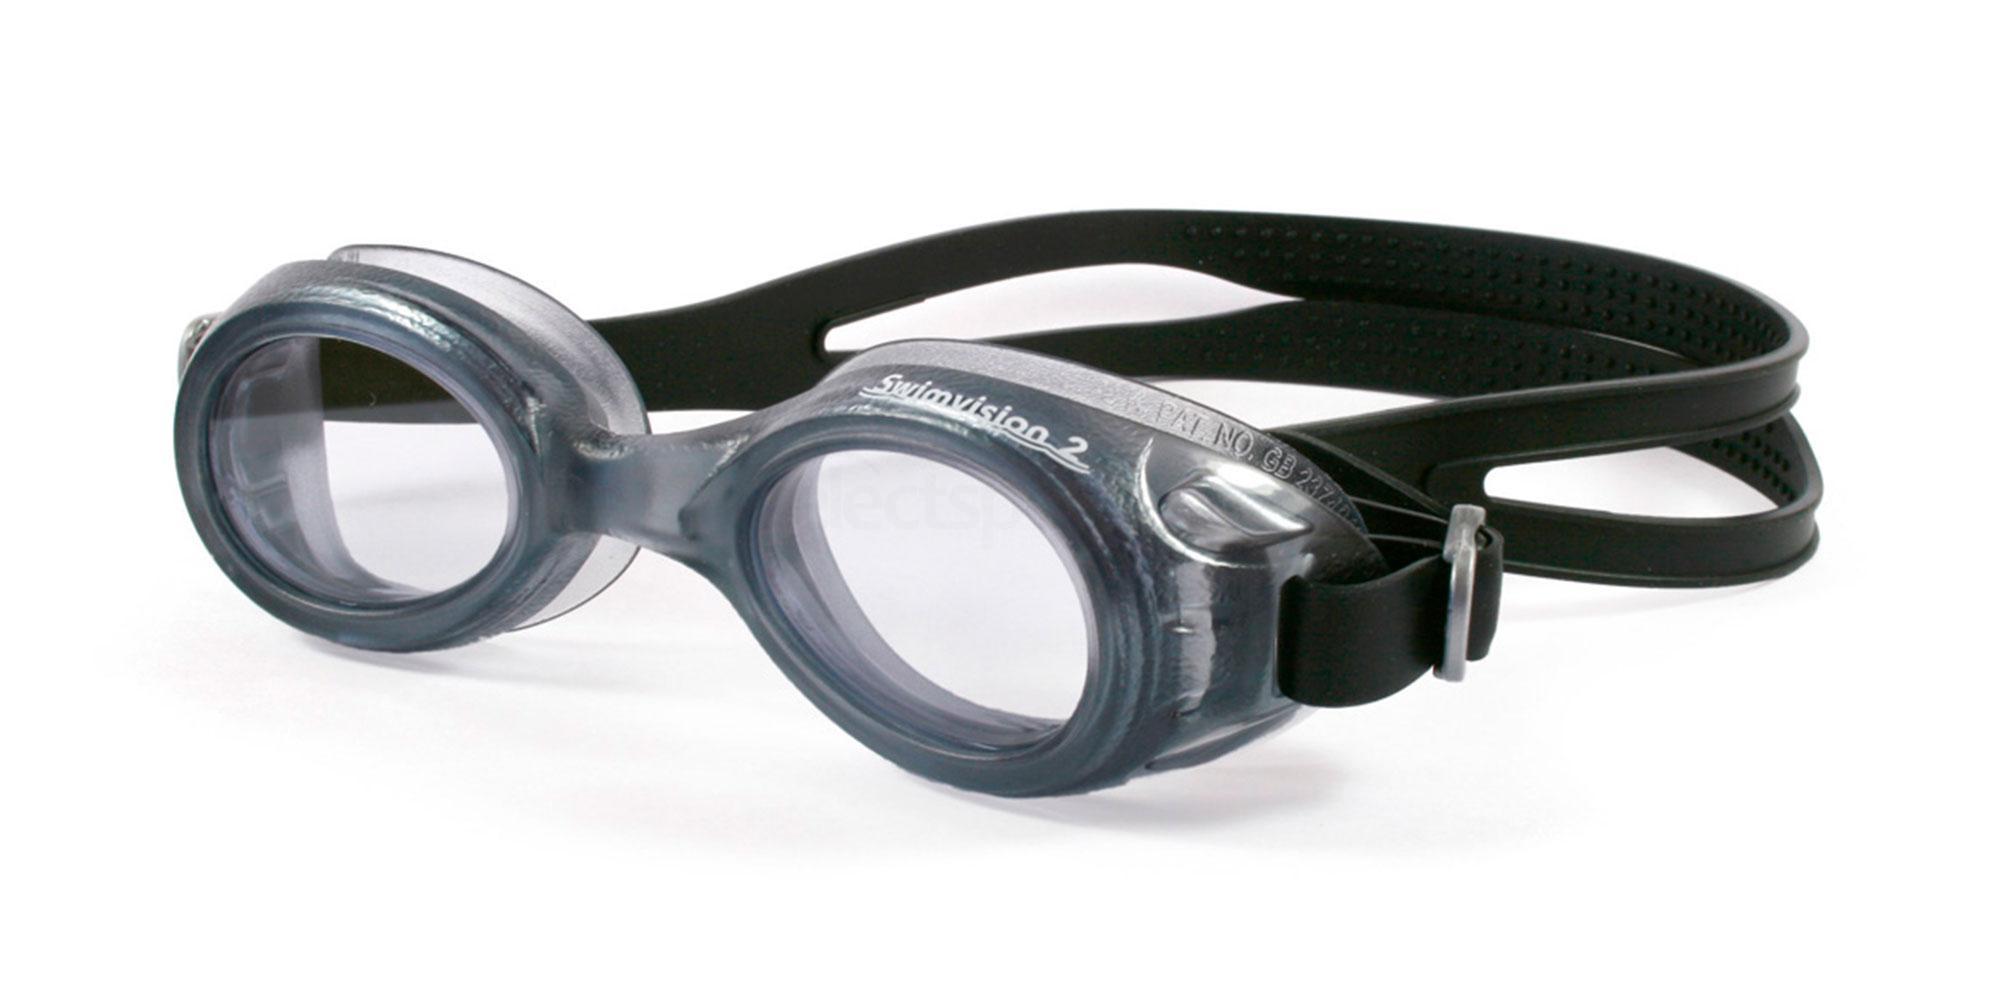 Smoke Swimvision 2 (8+ years) Accessories, Sports Eyewear Kids